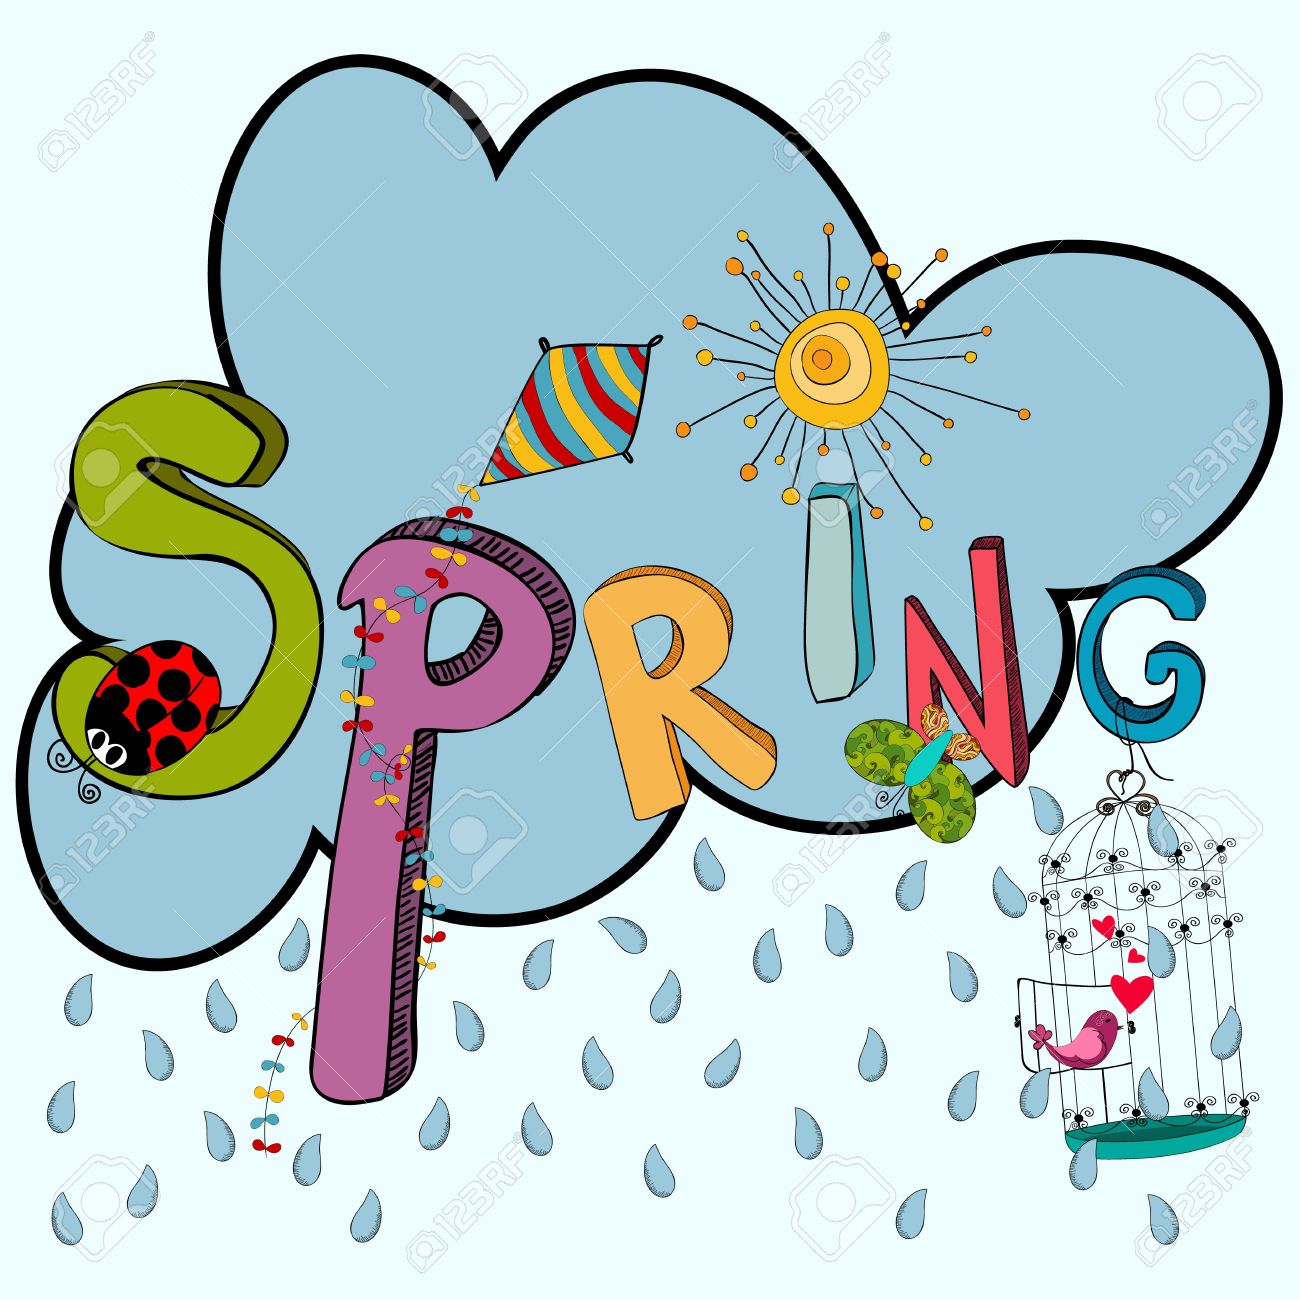 Cloud Rain With Vibrant Spring Elements: Kite, Ladybug, Birds.